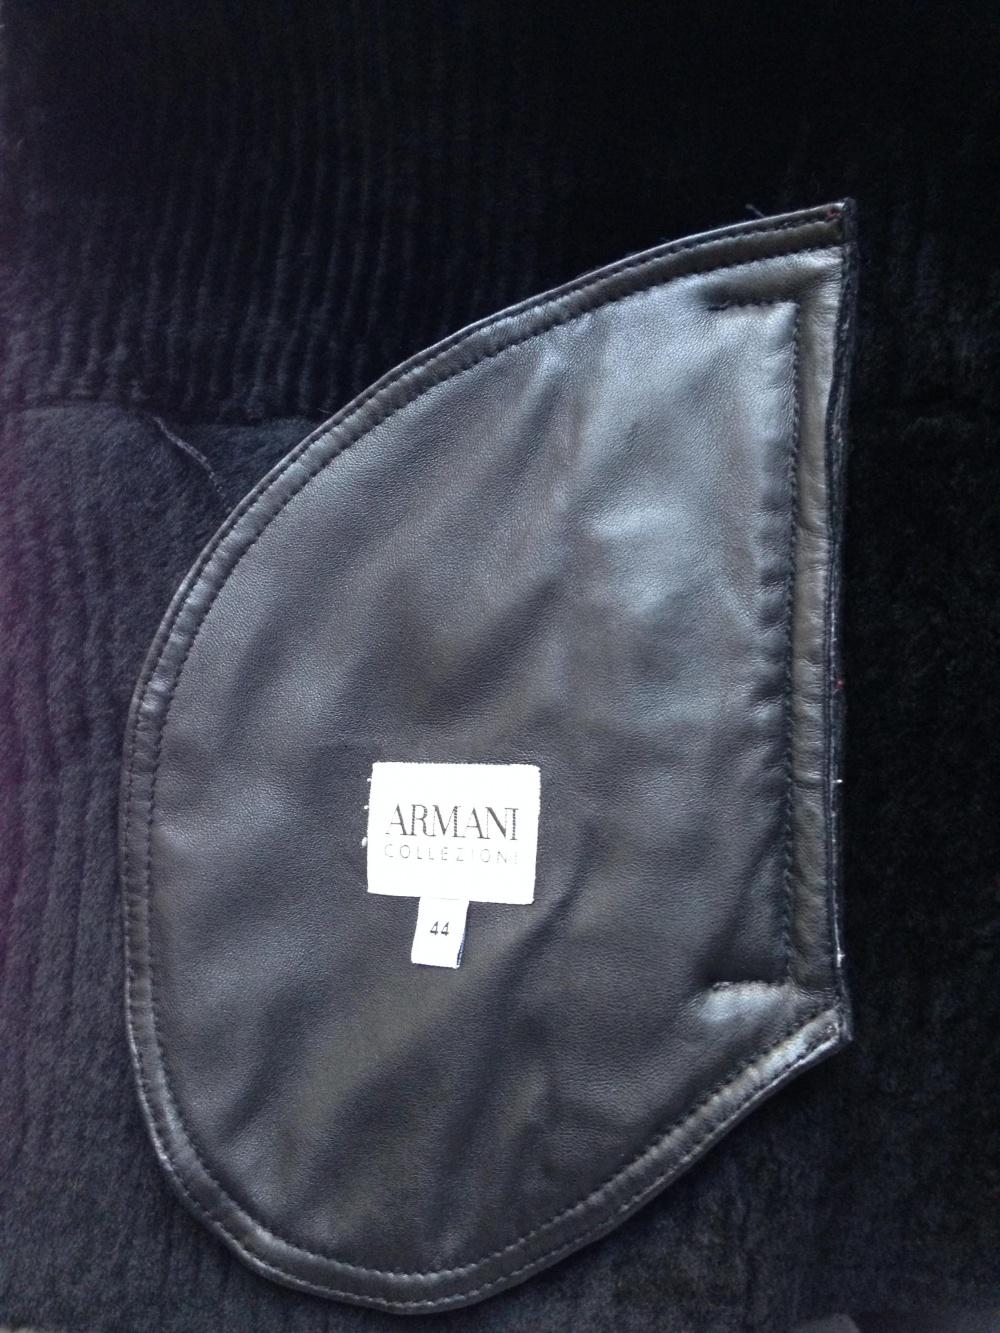 "Дубленка "" ARMANI Сollezioni "", 44 размер, Италия."